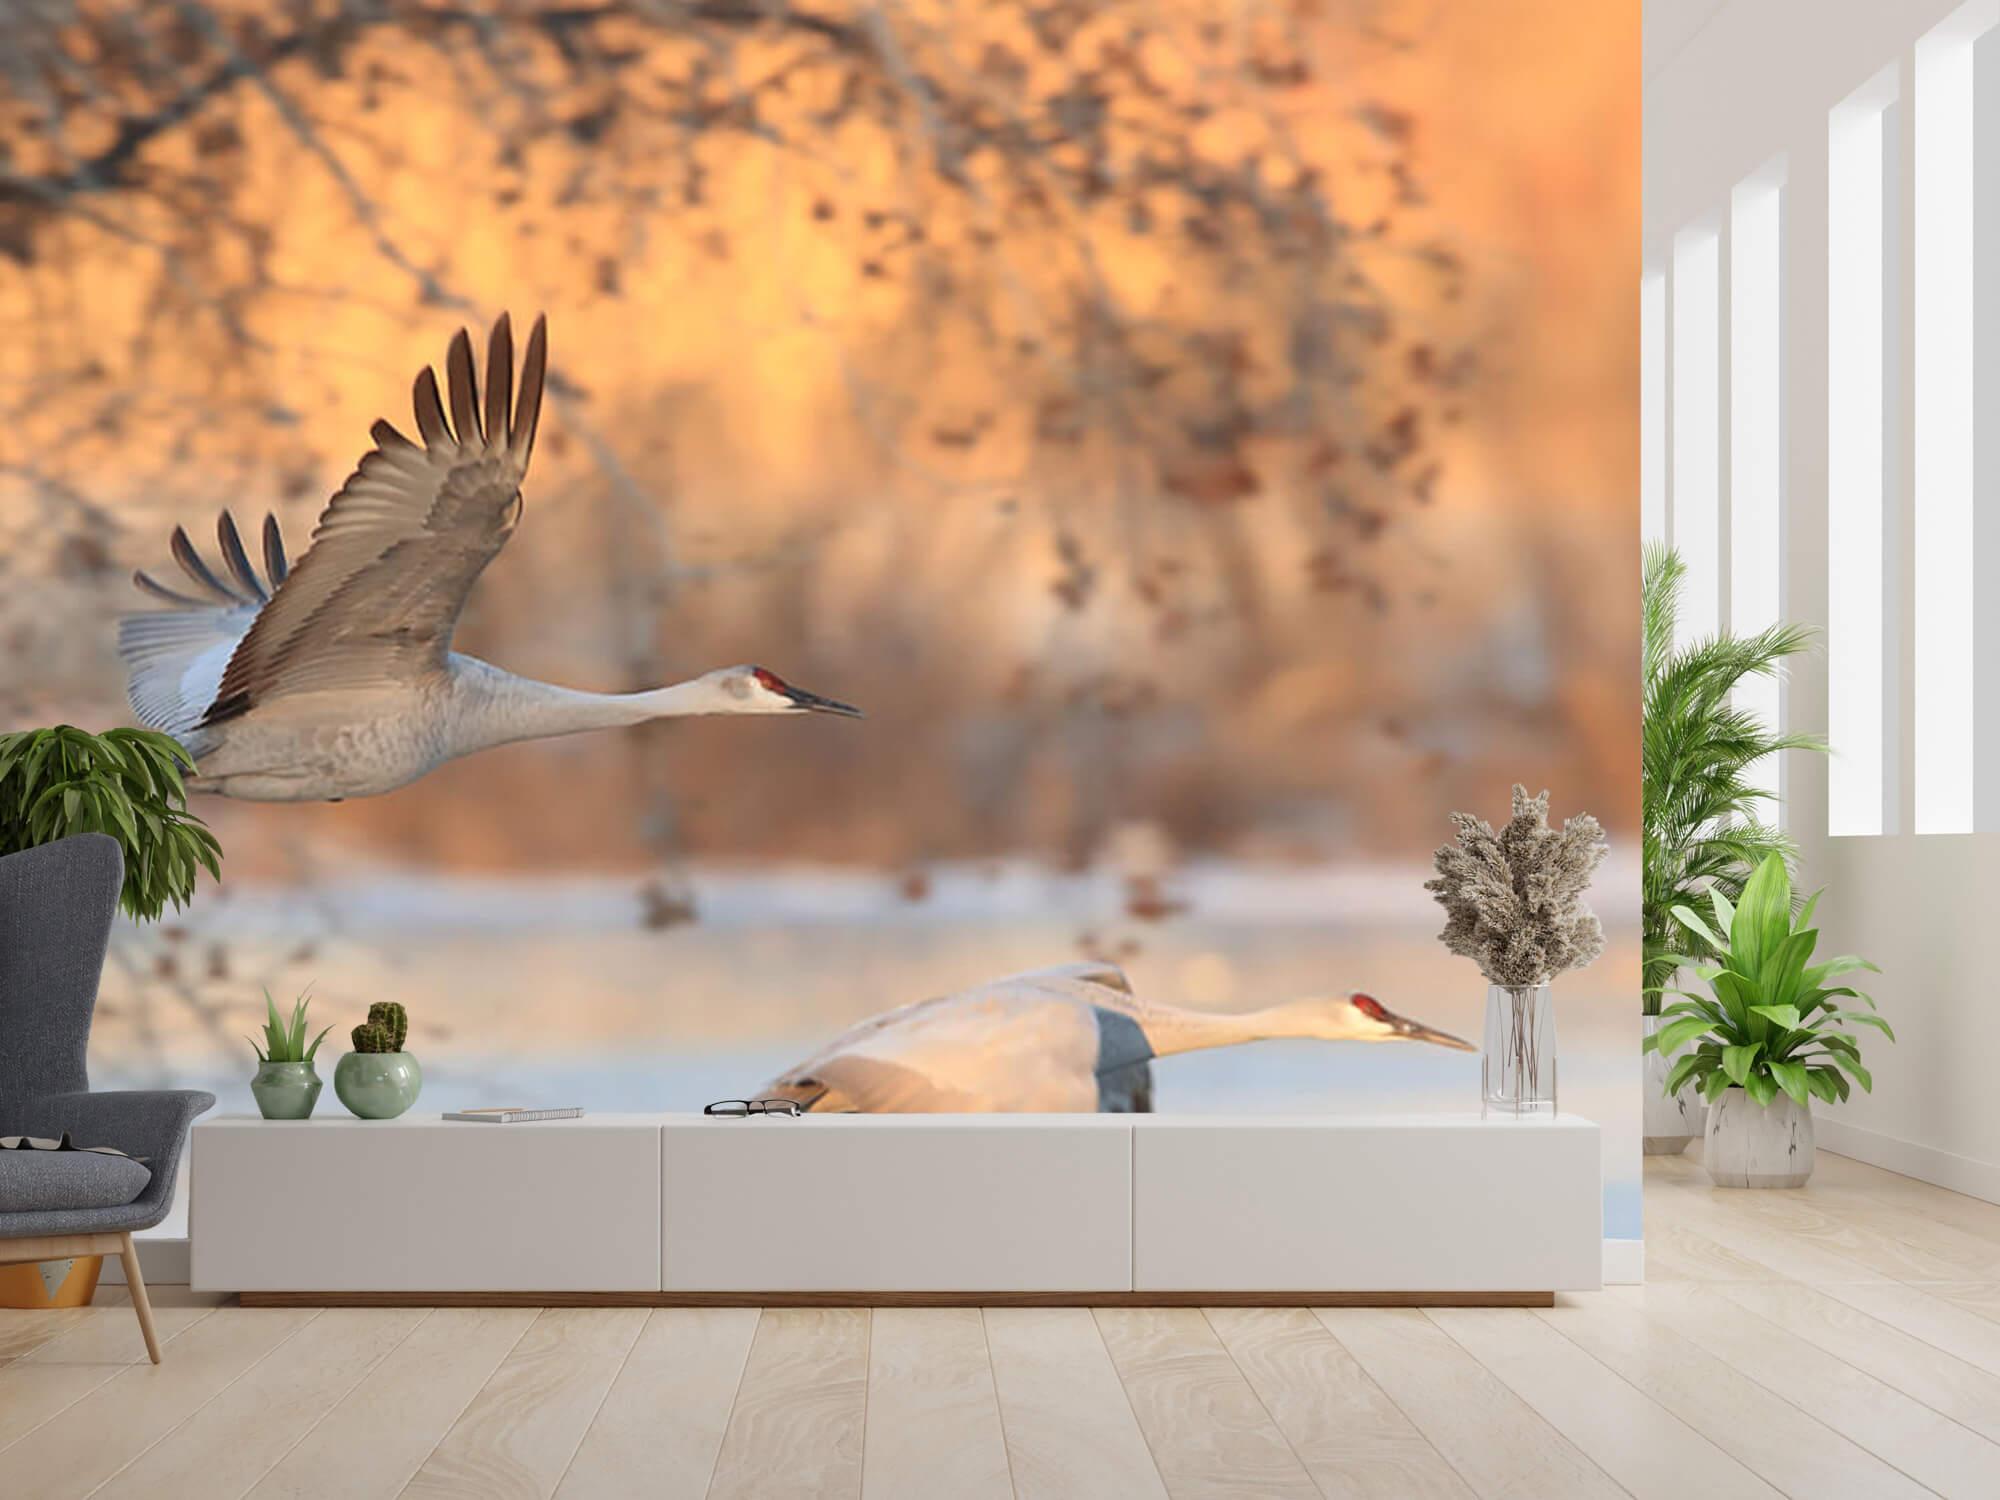 Vliegende kraanvogels 4